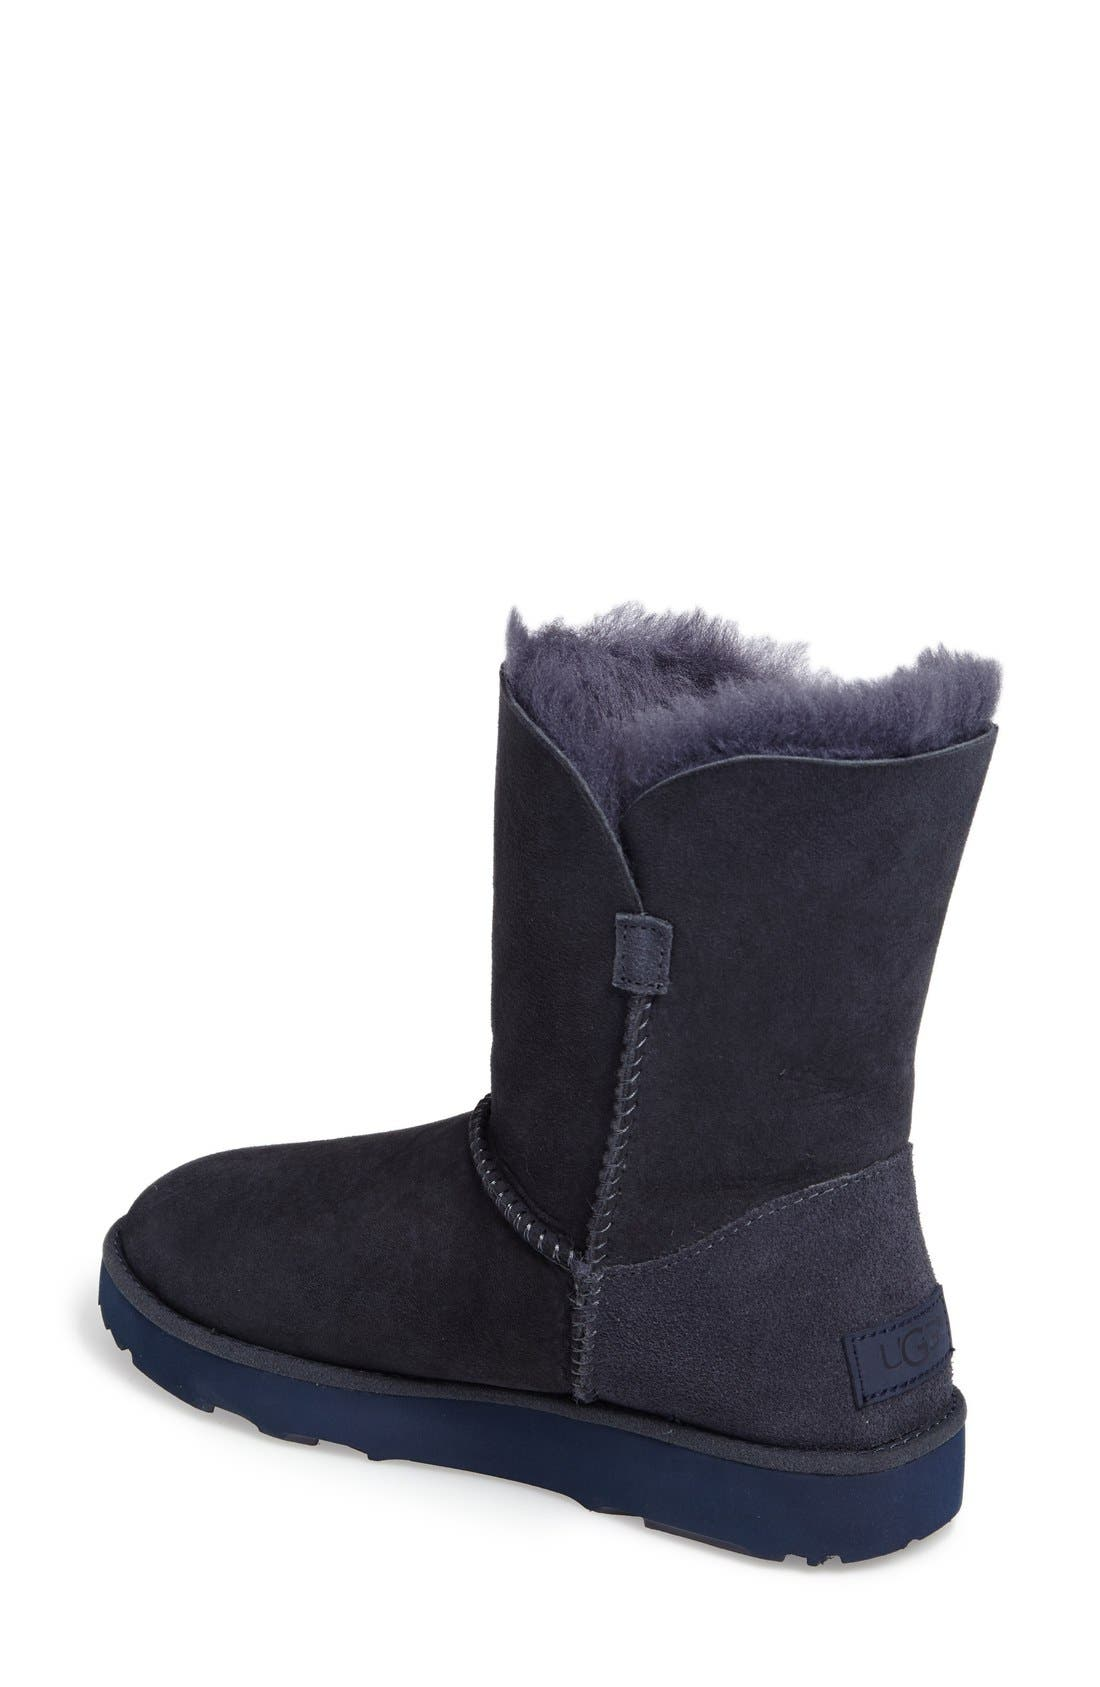 Alternate Image 2  - UGG® Classic Cuff Short Boot (Women)